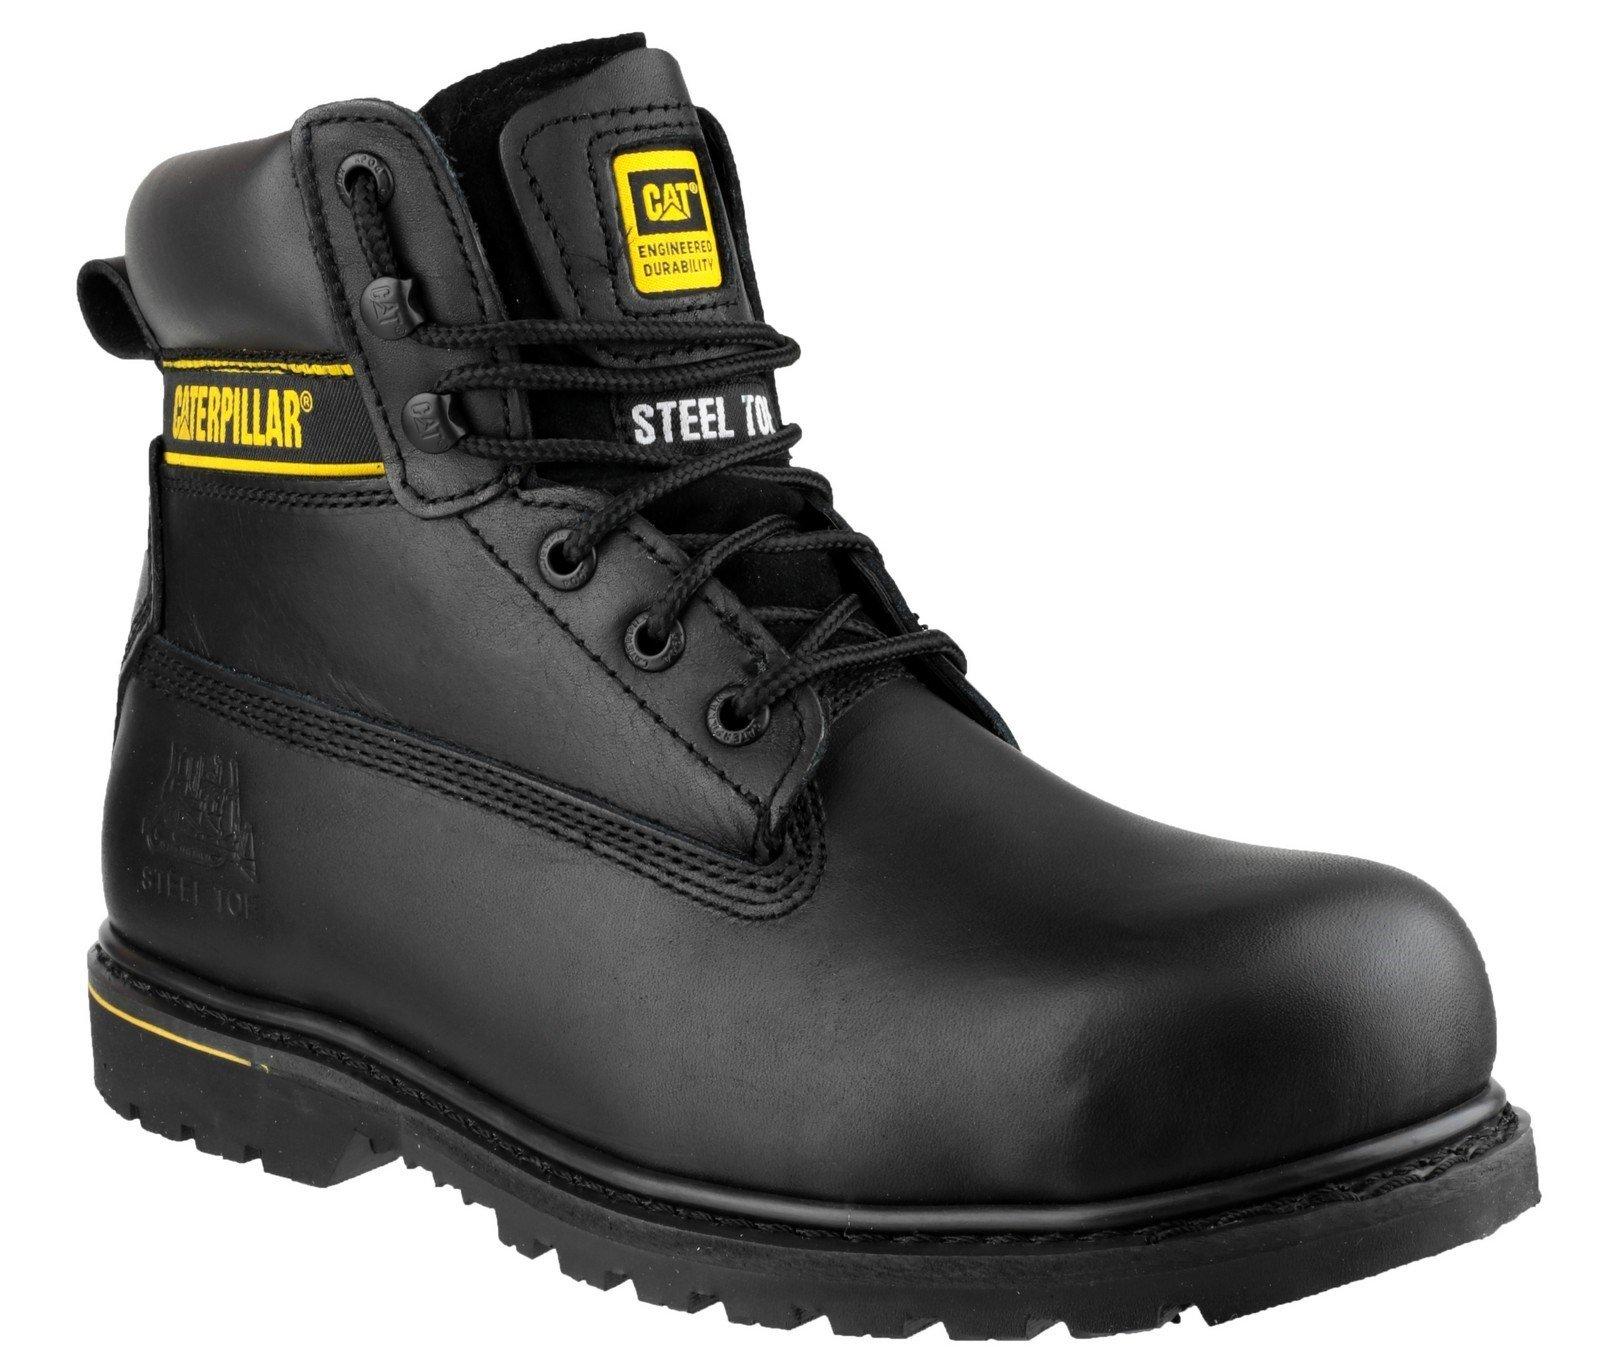 Caterpillar Men's Holton Safety Boot Black 12806 - Black 6